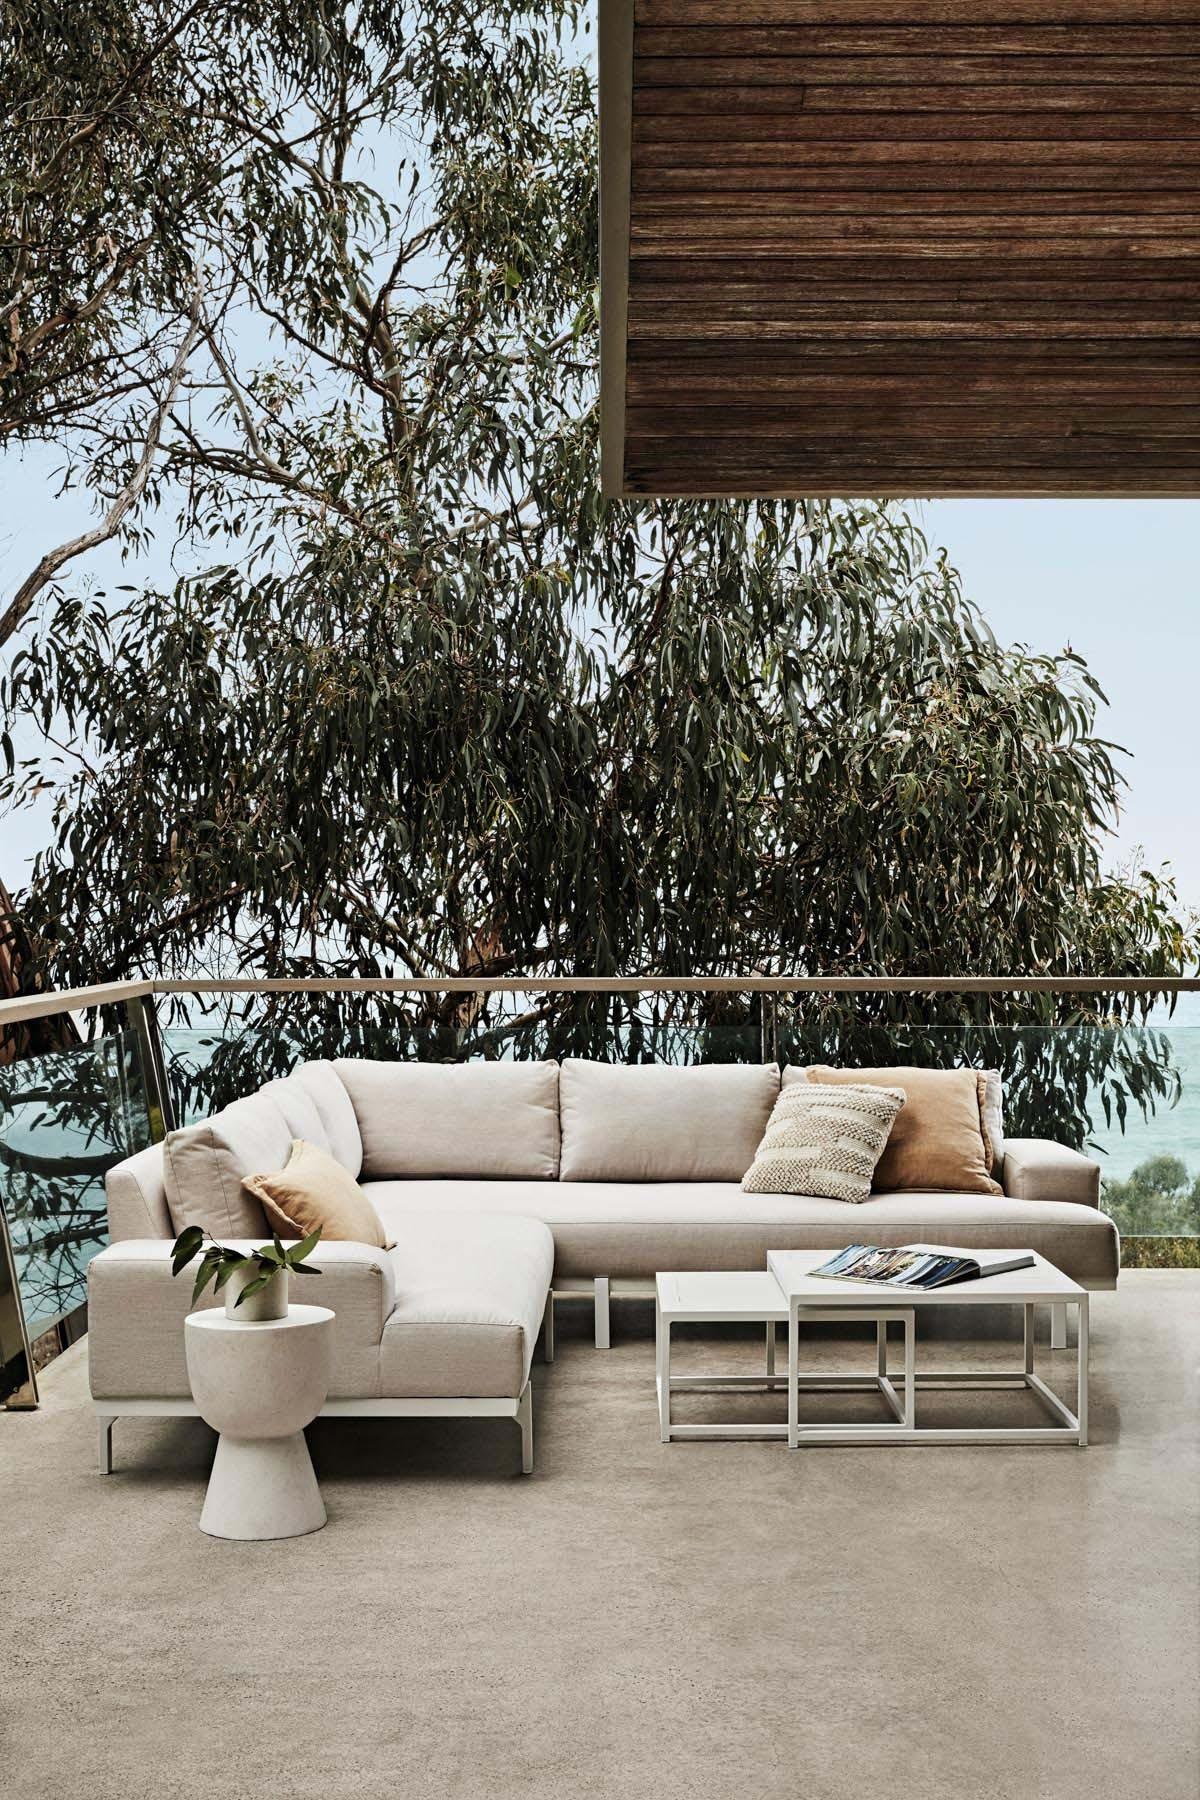 Furniture Gallery Sofas aruba-platform-chaise-01